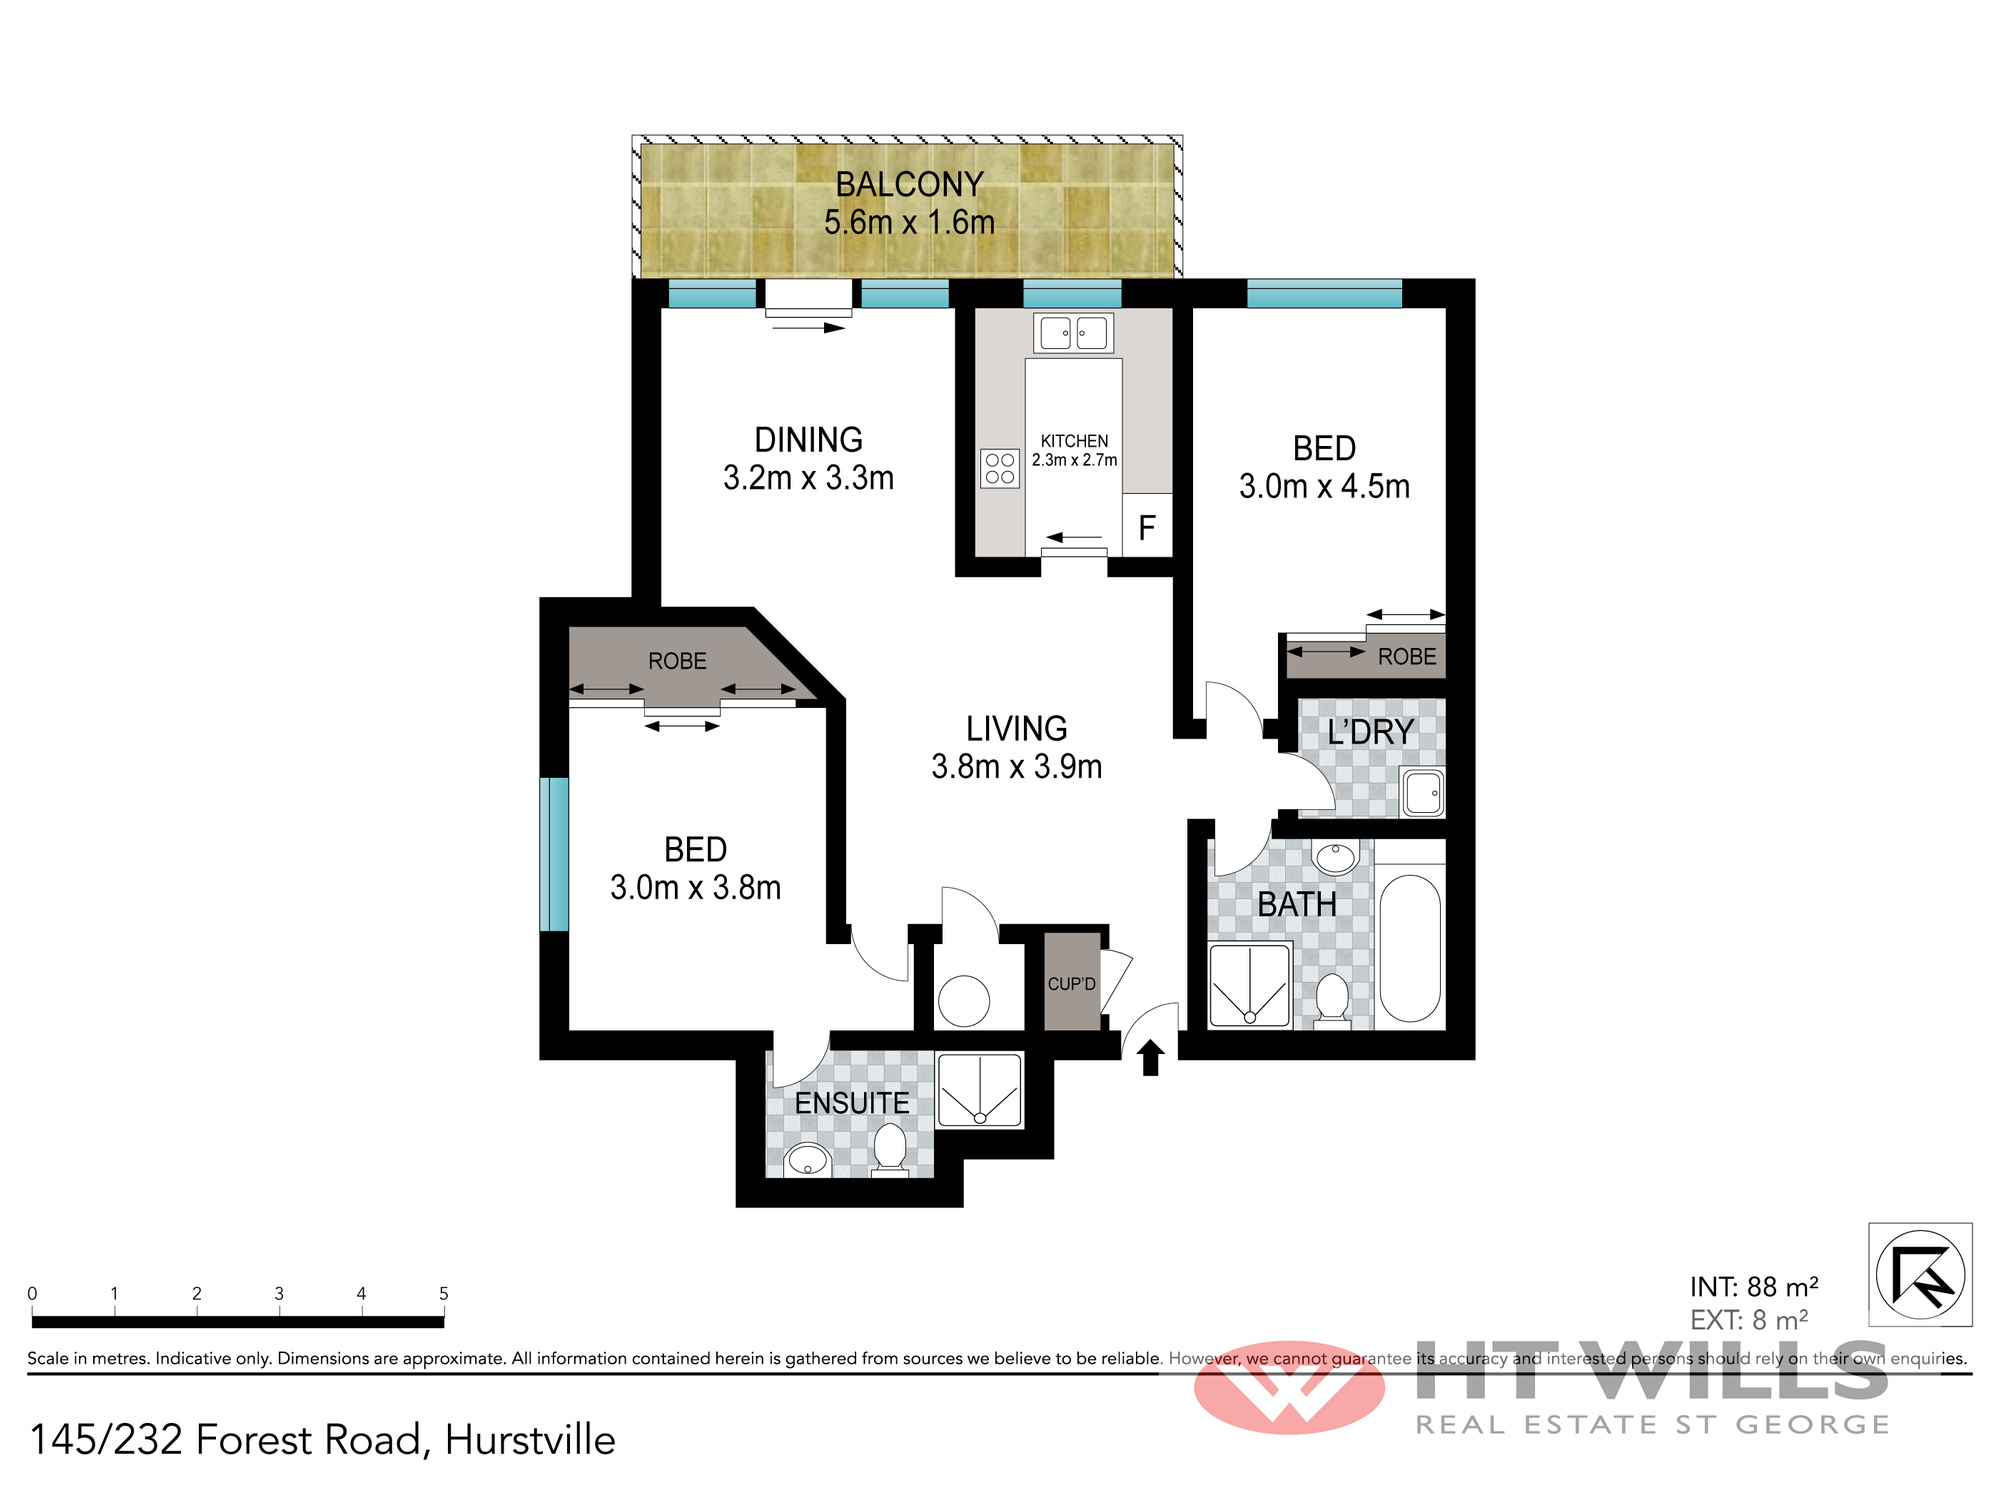 Image: Sunny 11th floor apartment